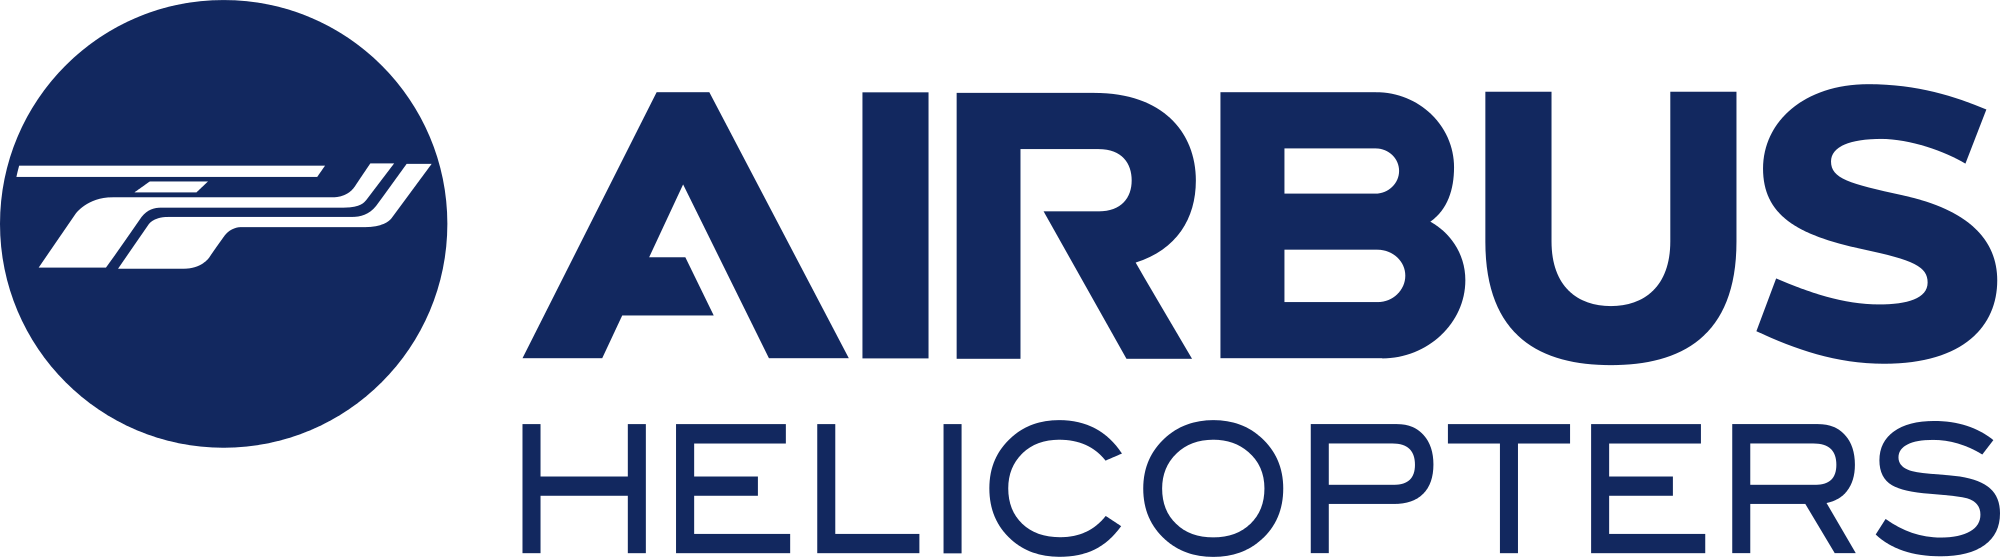 Airbus Logo Vector PNG - 97662